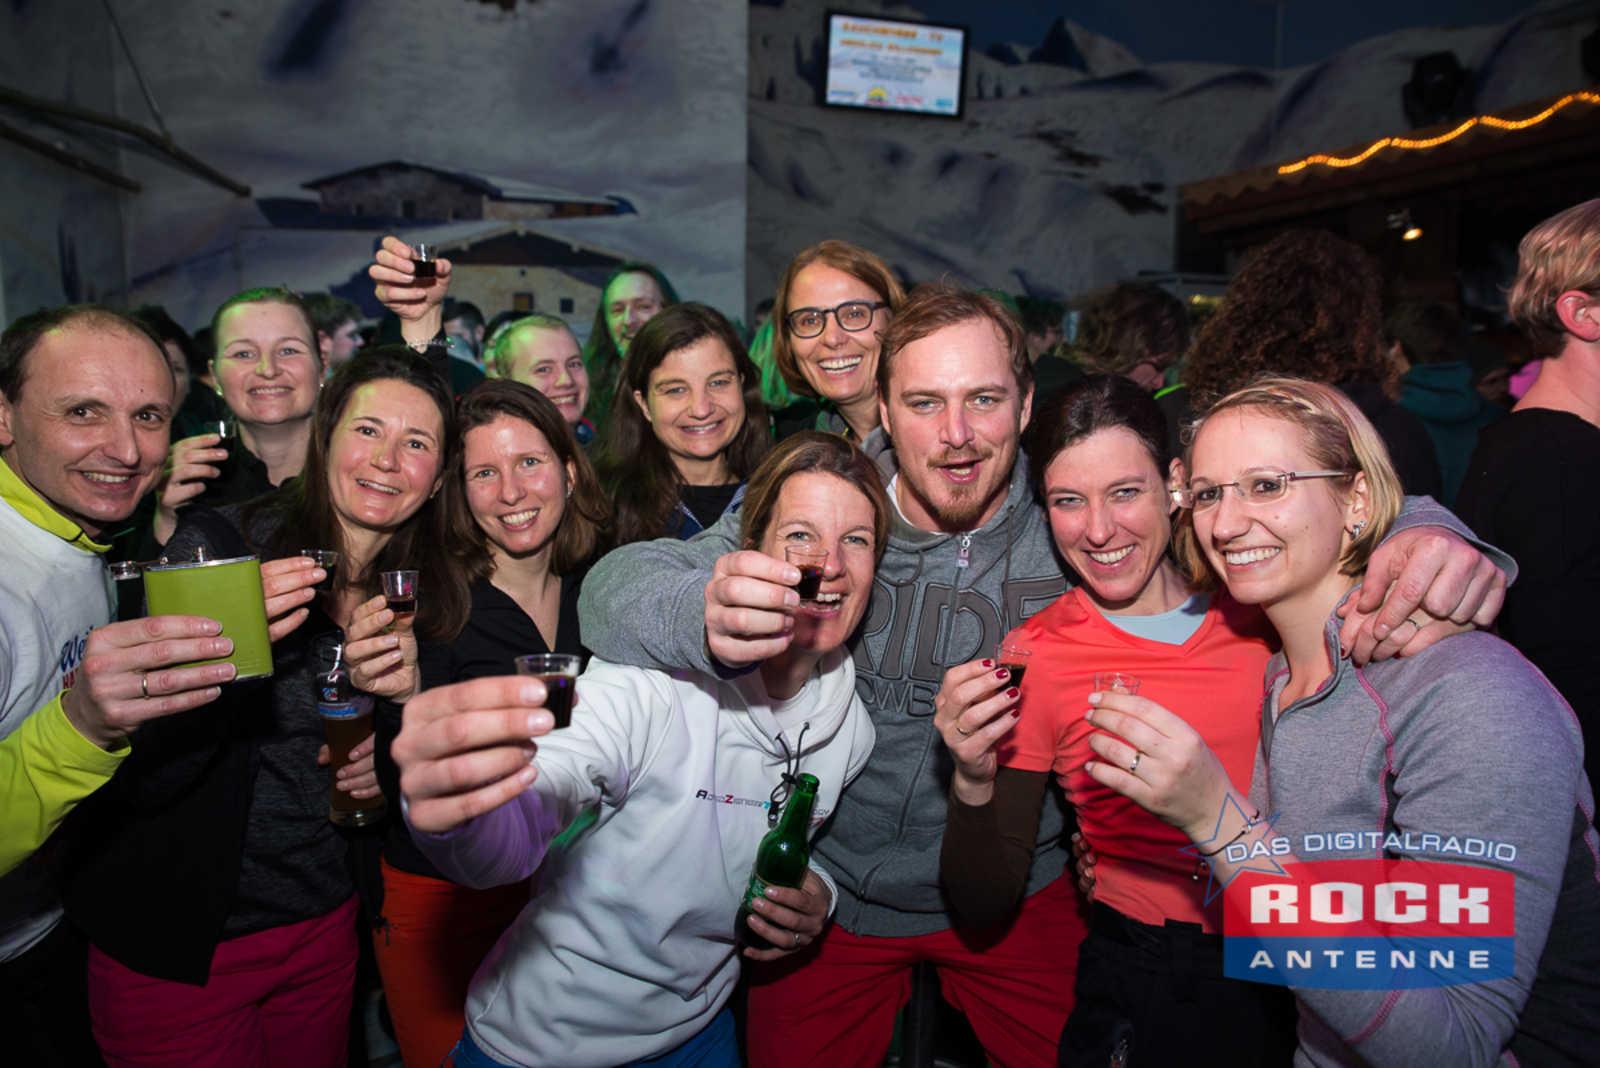 ROCK THE MOUNTAIN Zauchensee, 18.02.2017 | ROCK ANTENNE